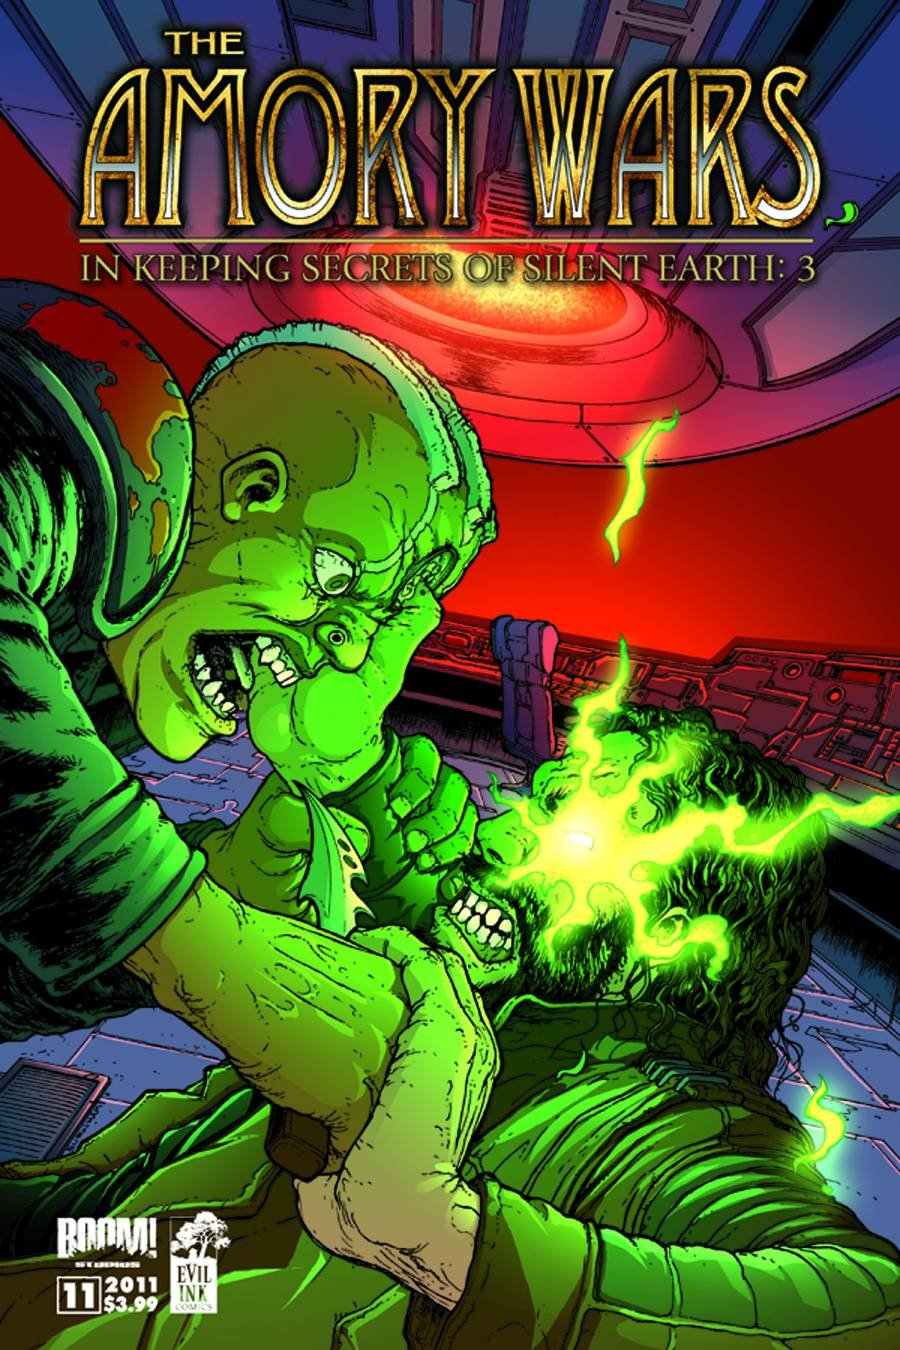 AMORY WARS KEEPING SECRETS OF SILENT EARTH 3 #11 (OF 12) near mint comic